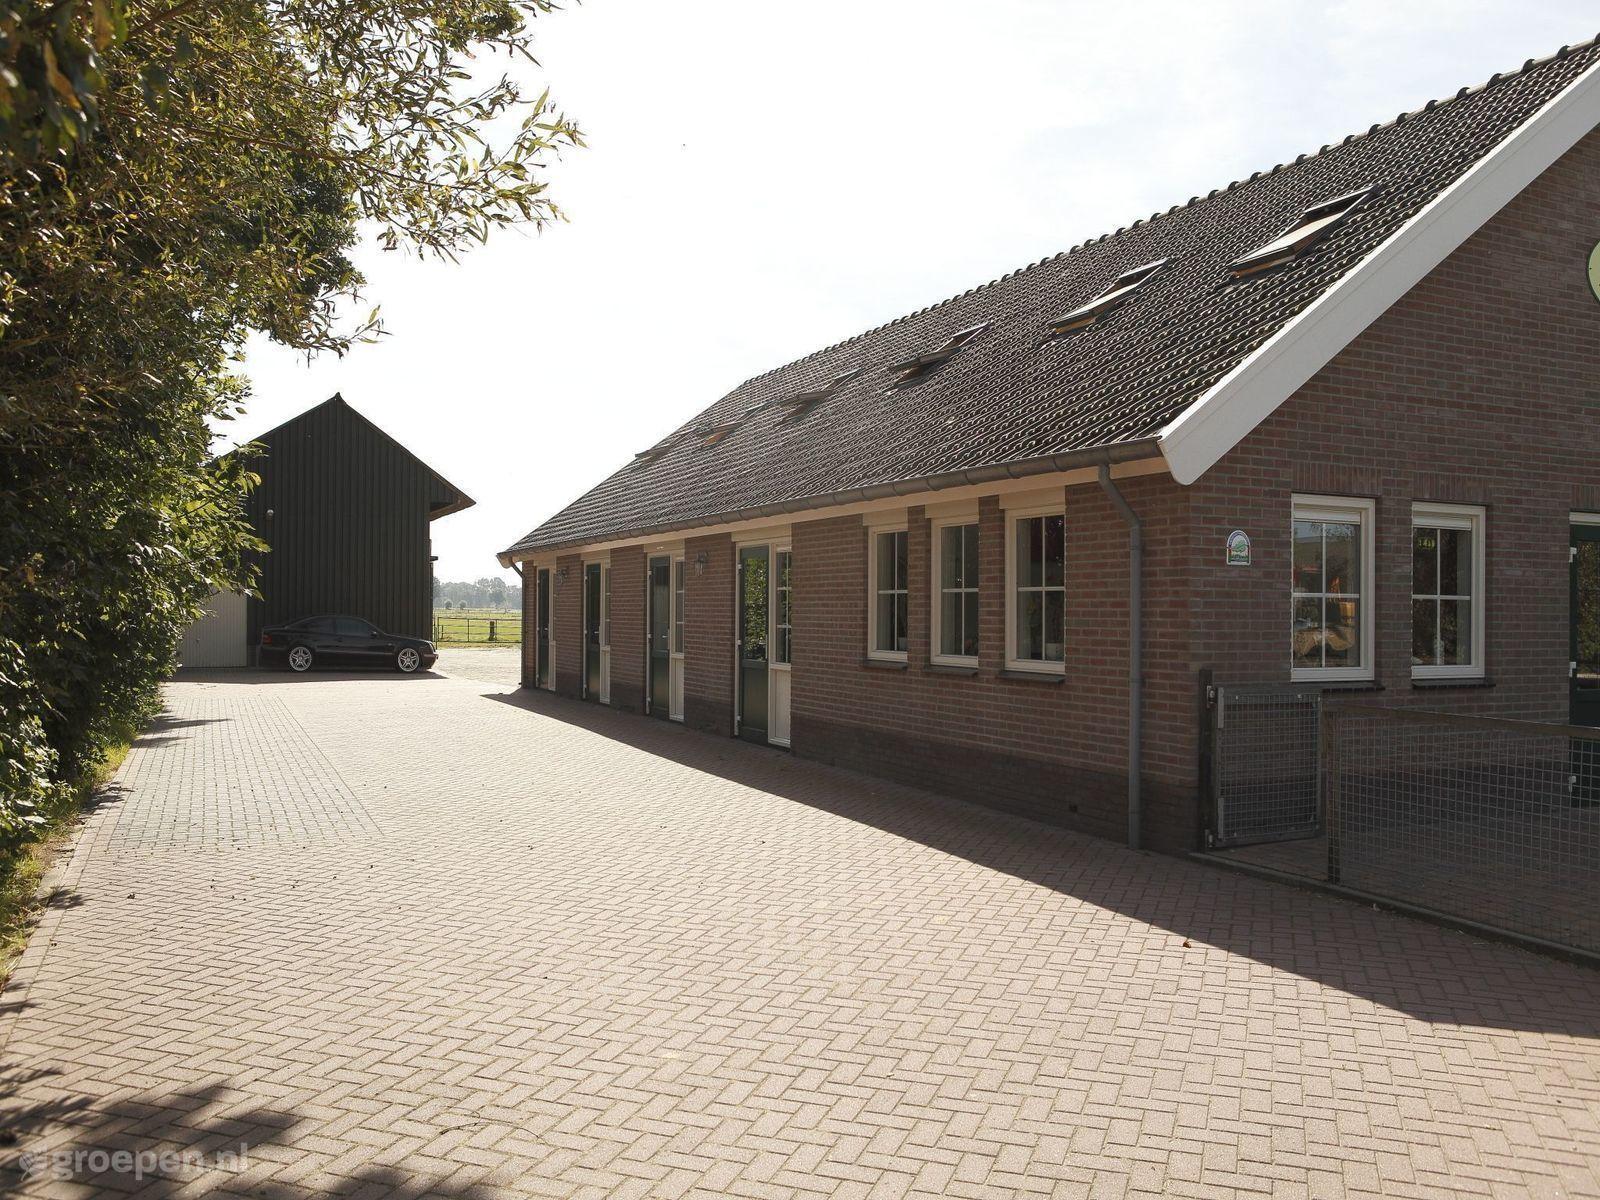 Gruppenunterkunft Woudenberg